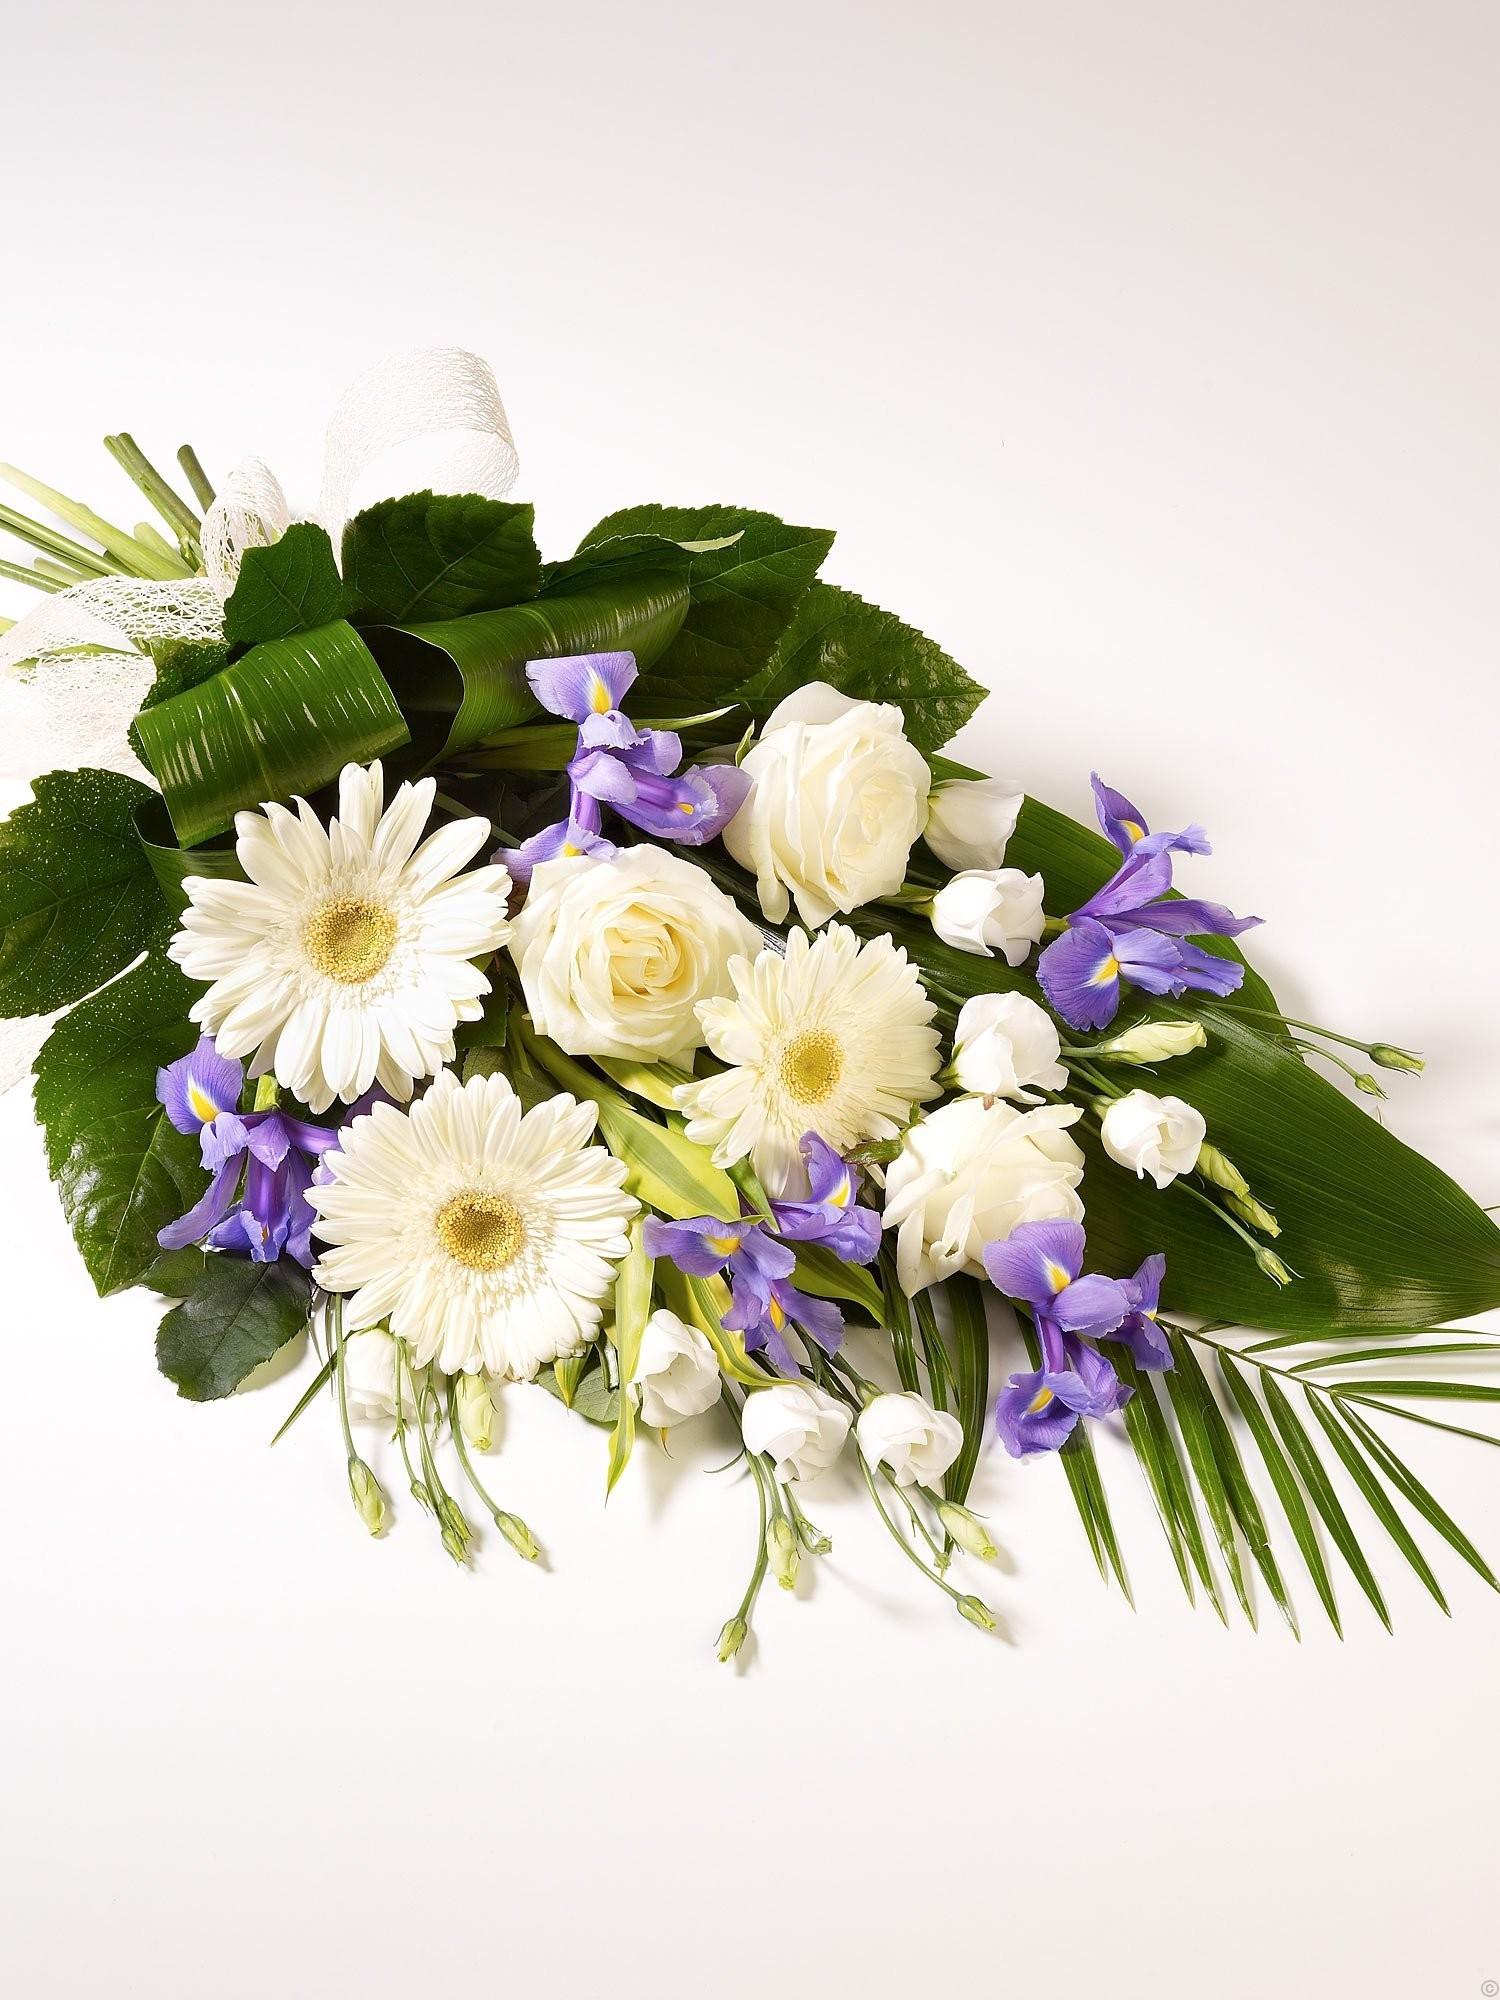 Funeral Flowers Free Delivery Send Funeral Arrangements Dublin Ireland